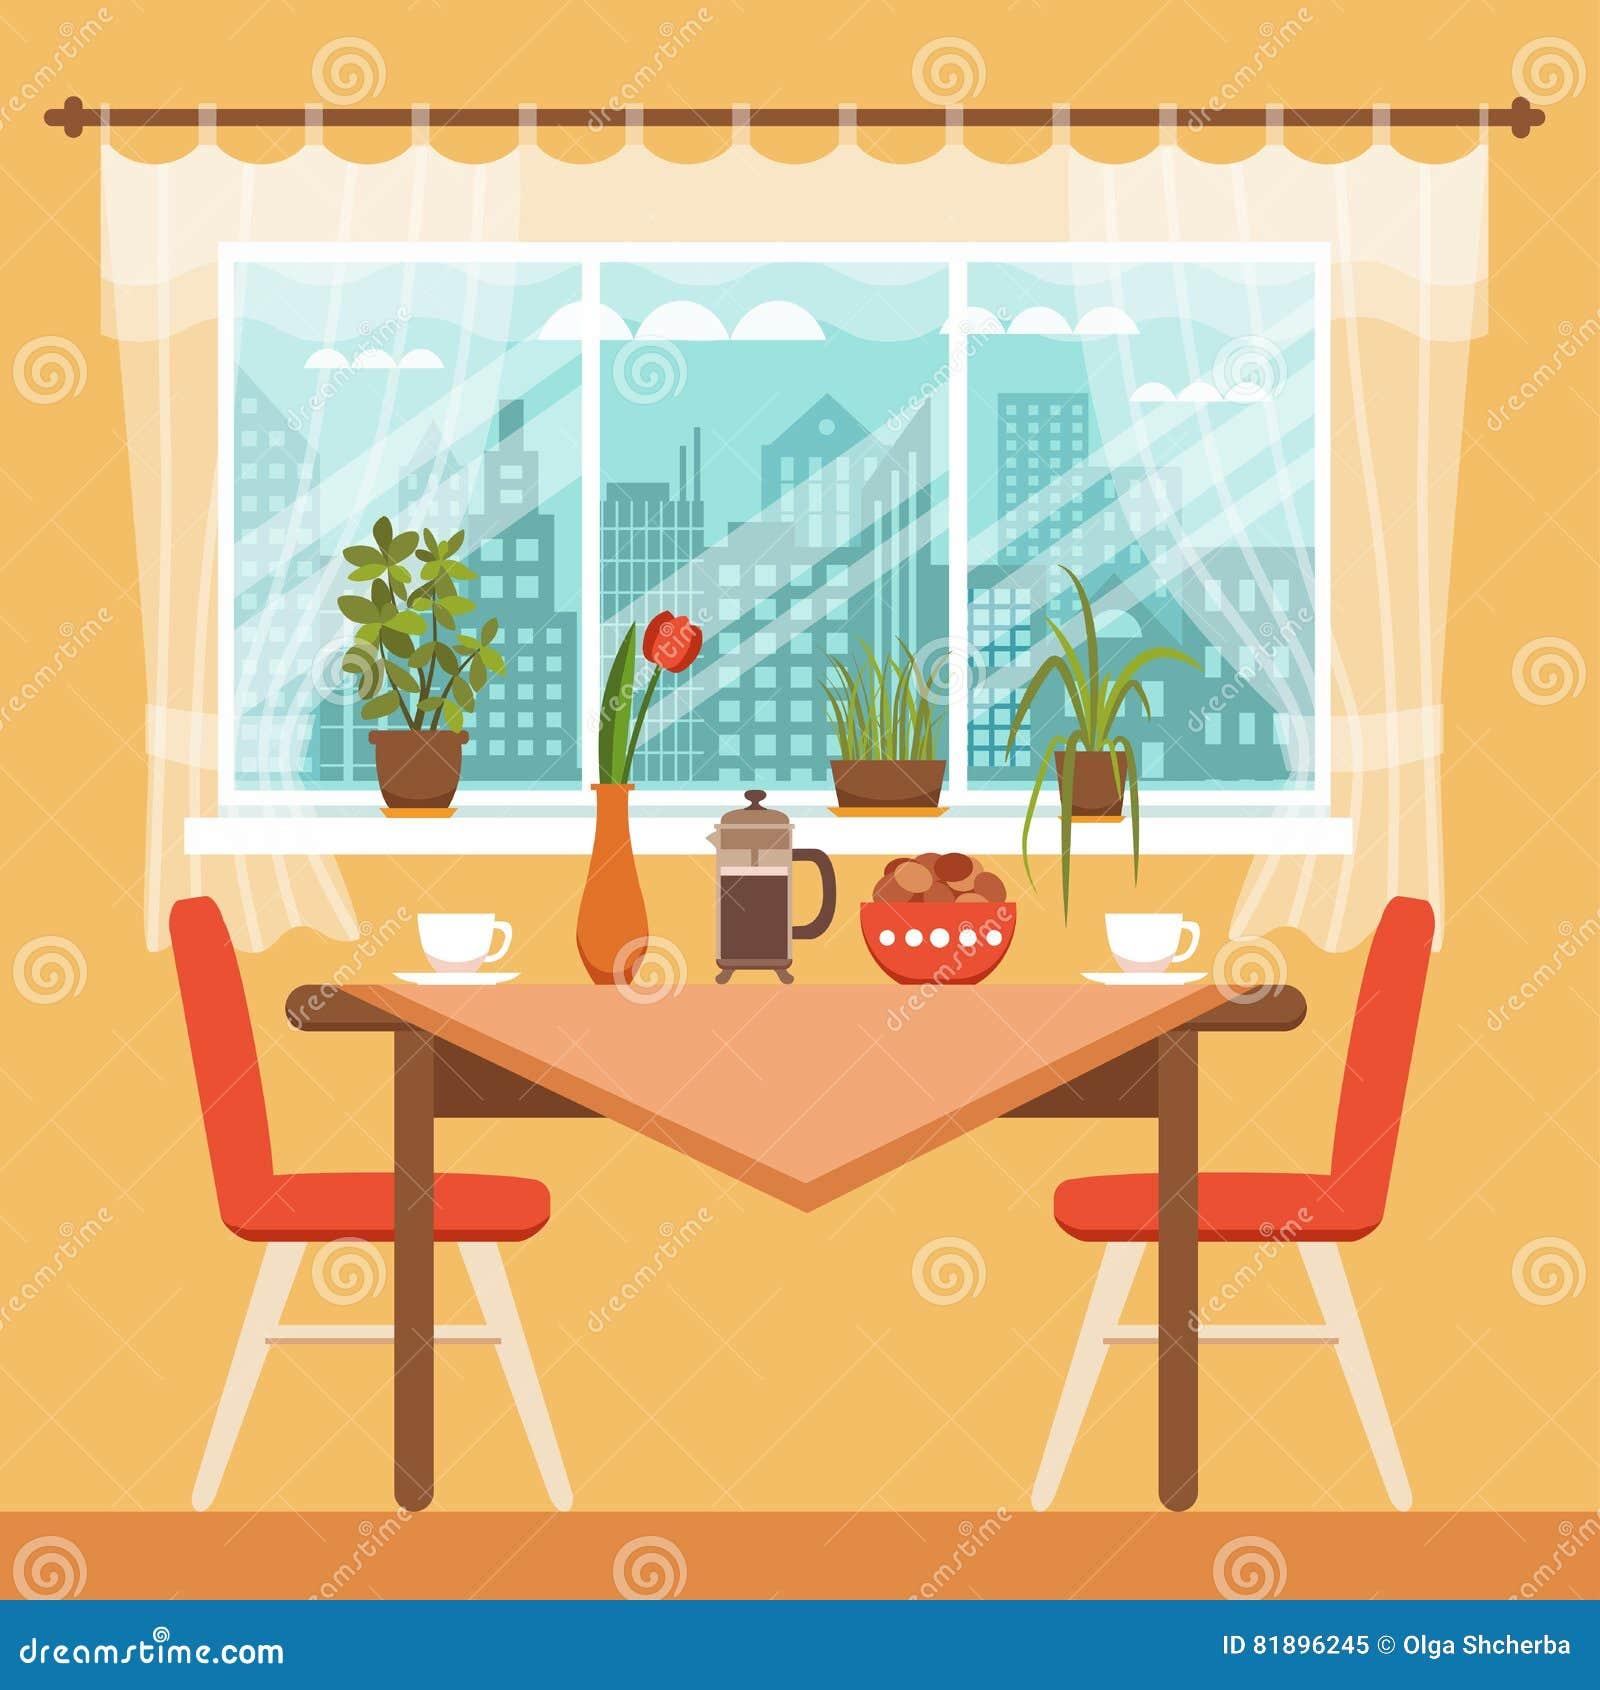 Escape Challenging Dining Room: Amazon.es: Appstore para ...